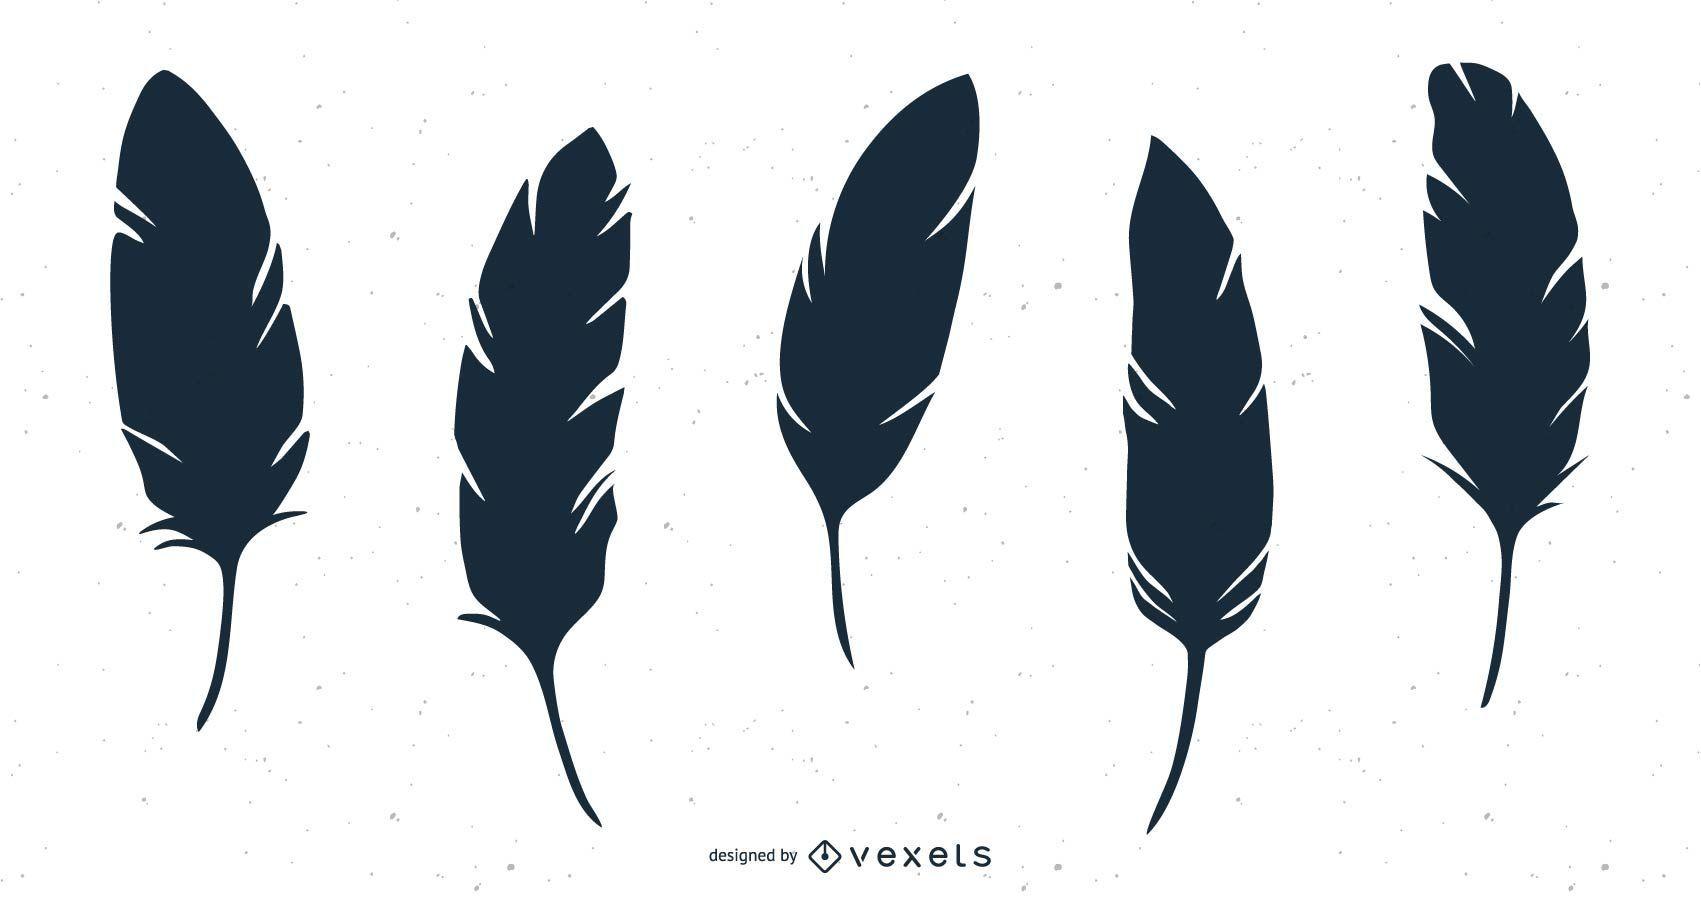 conjunto de ilustración de silueta de pluma